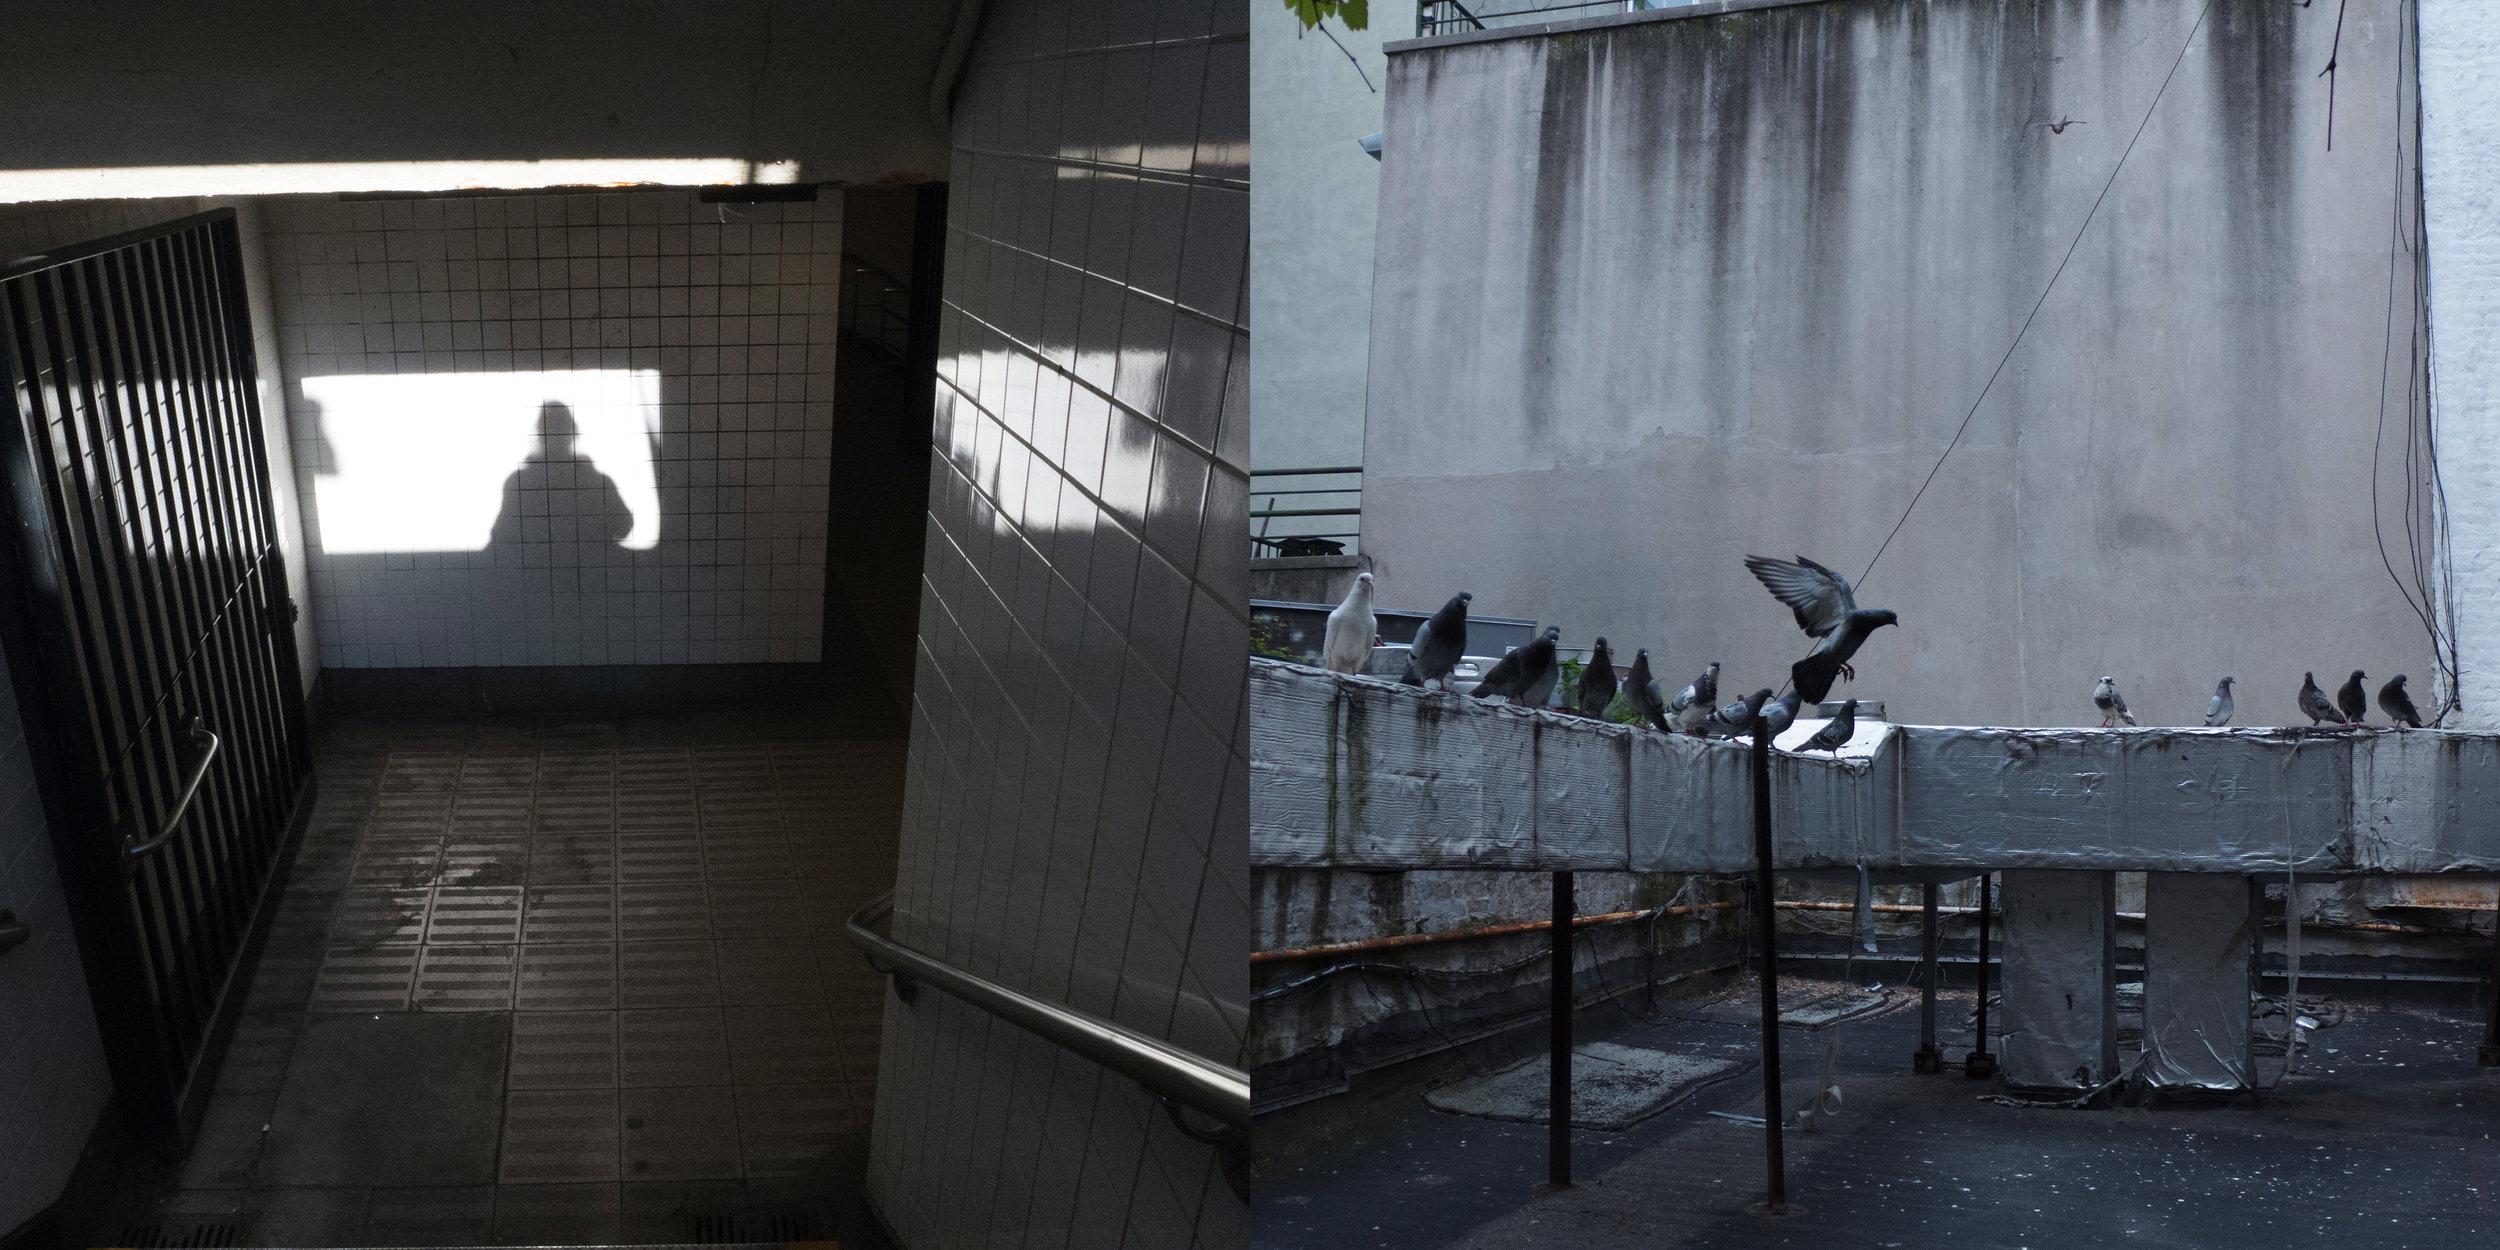 Self-portrait, Canal Street & Birds, New York Central Art Supply